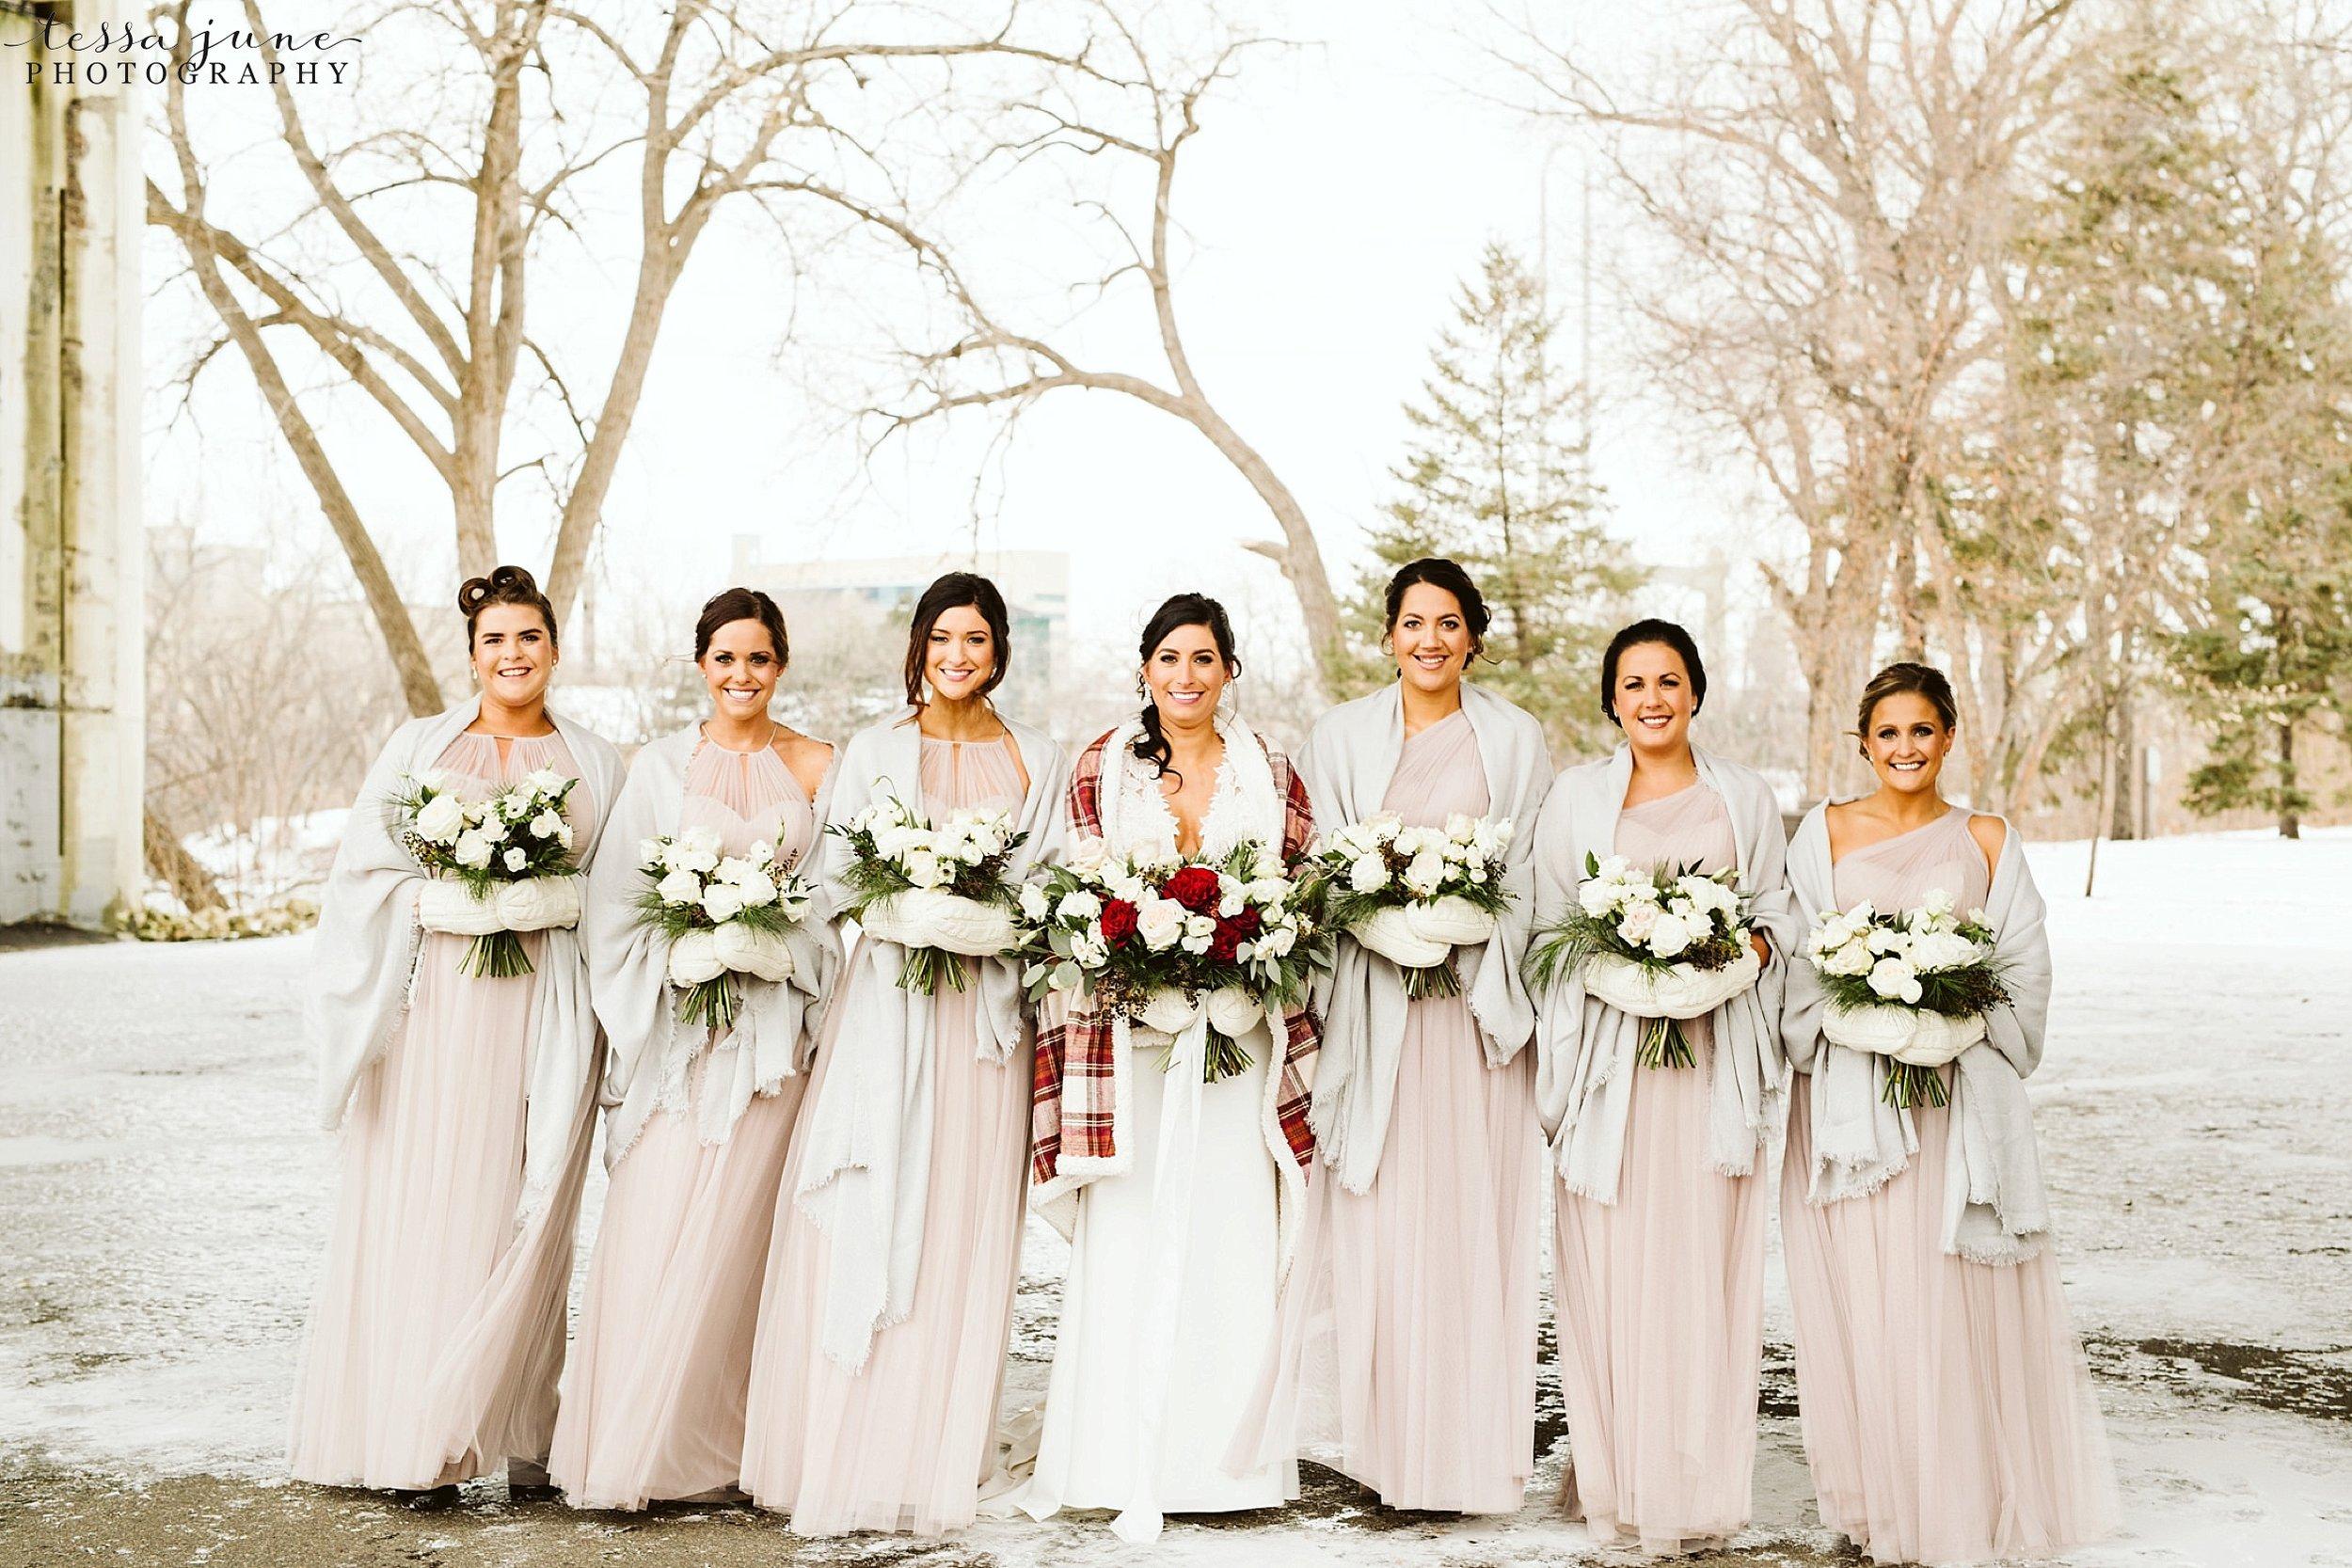 minneapolis-event-center-winter-romantic-snow-wedding-december-114.jpg